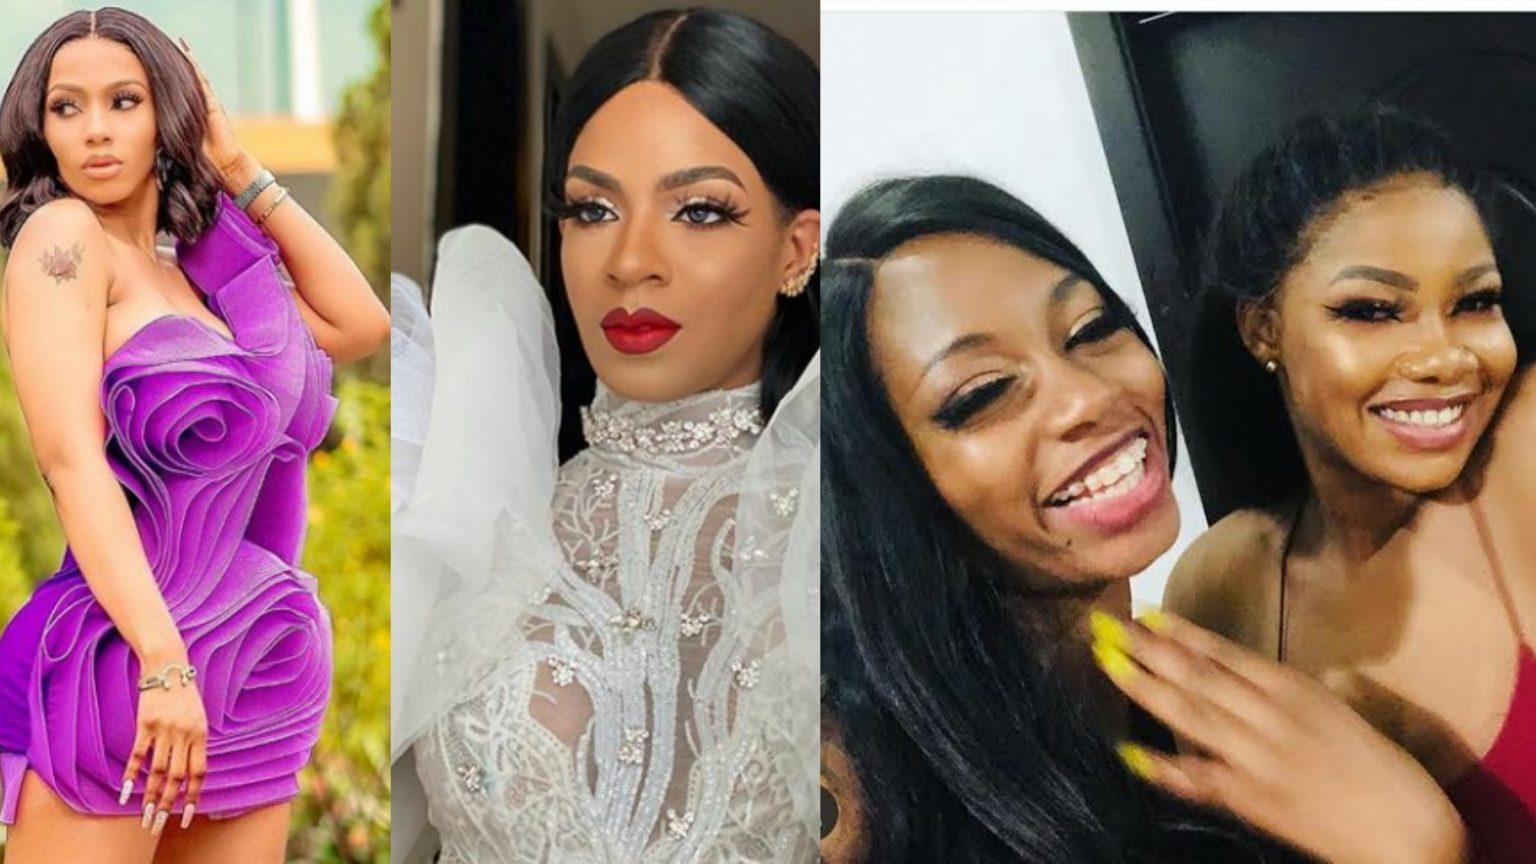 BBNaija ex-housemates Mercy, Tacha, Venita shade each other on Instagram